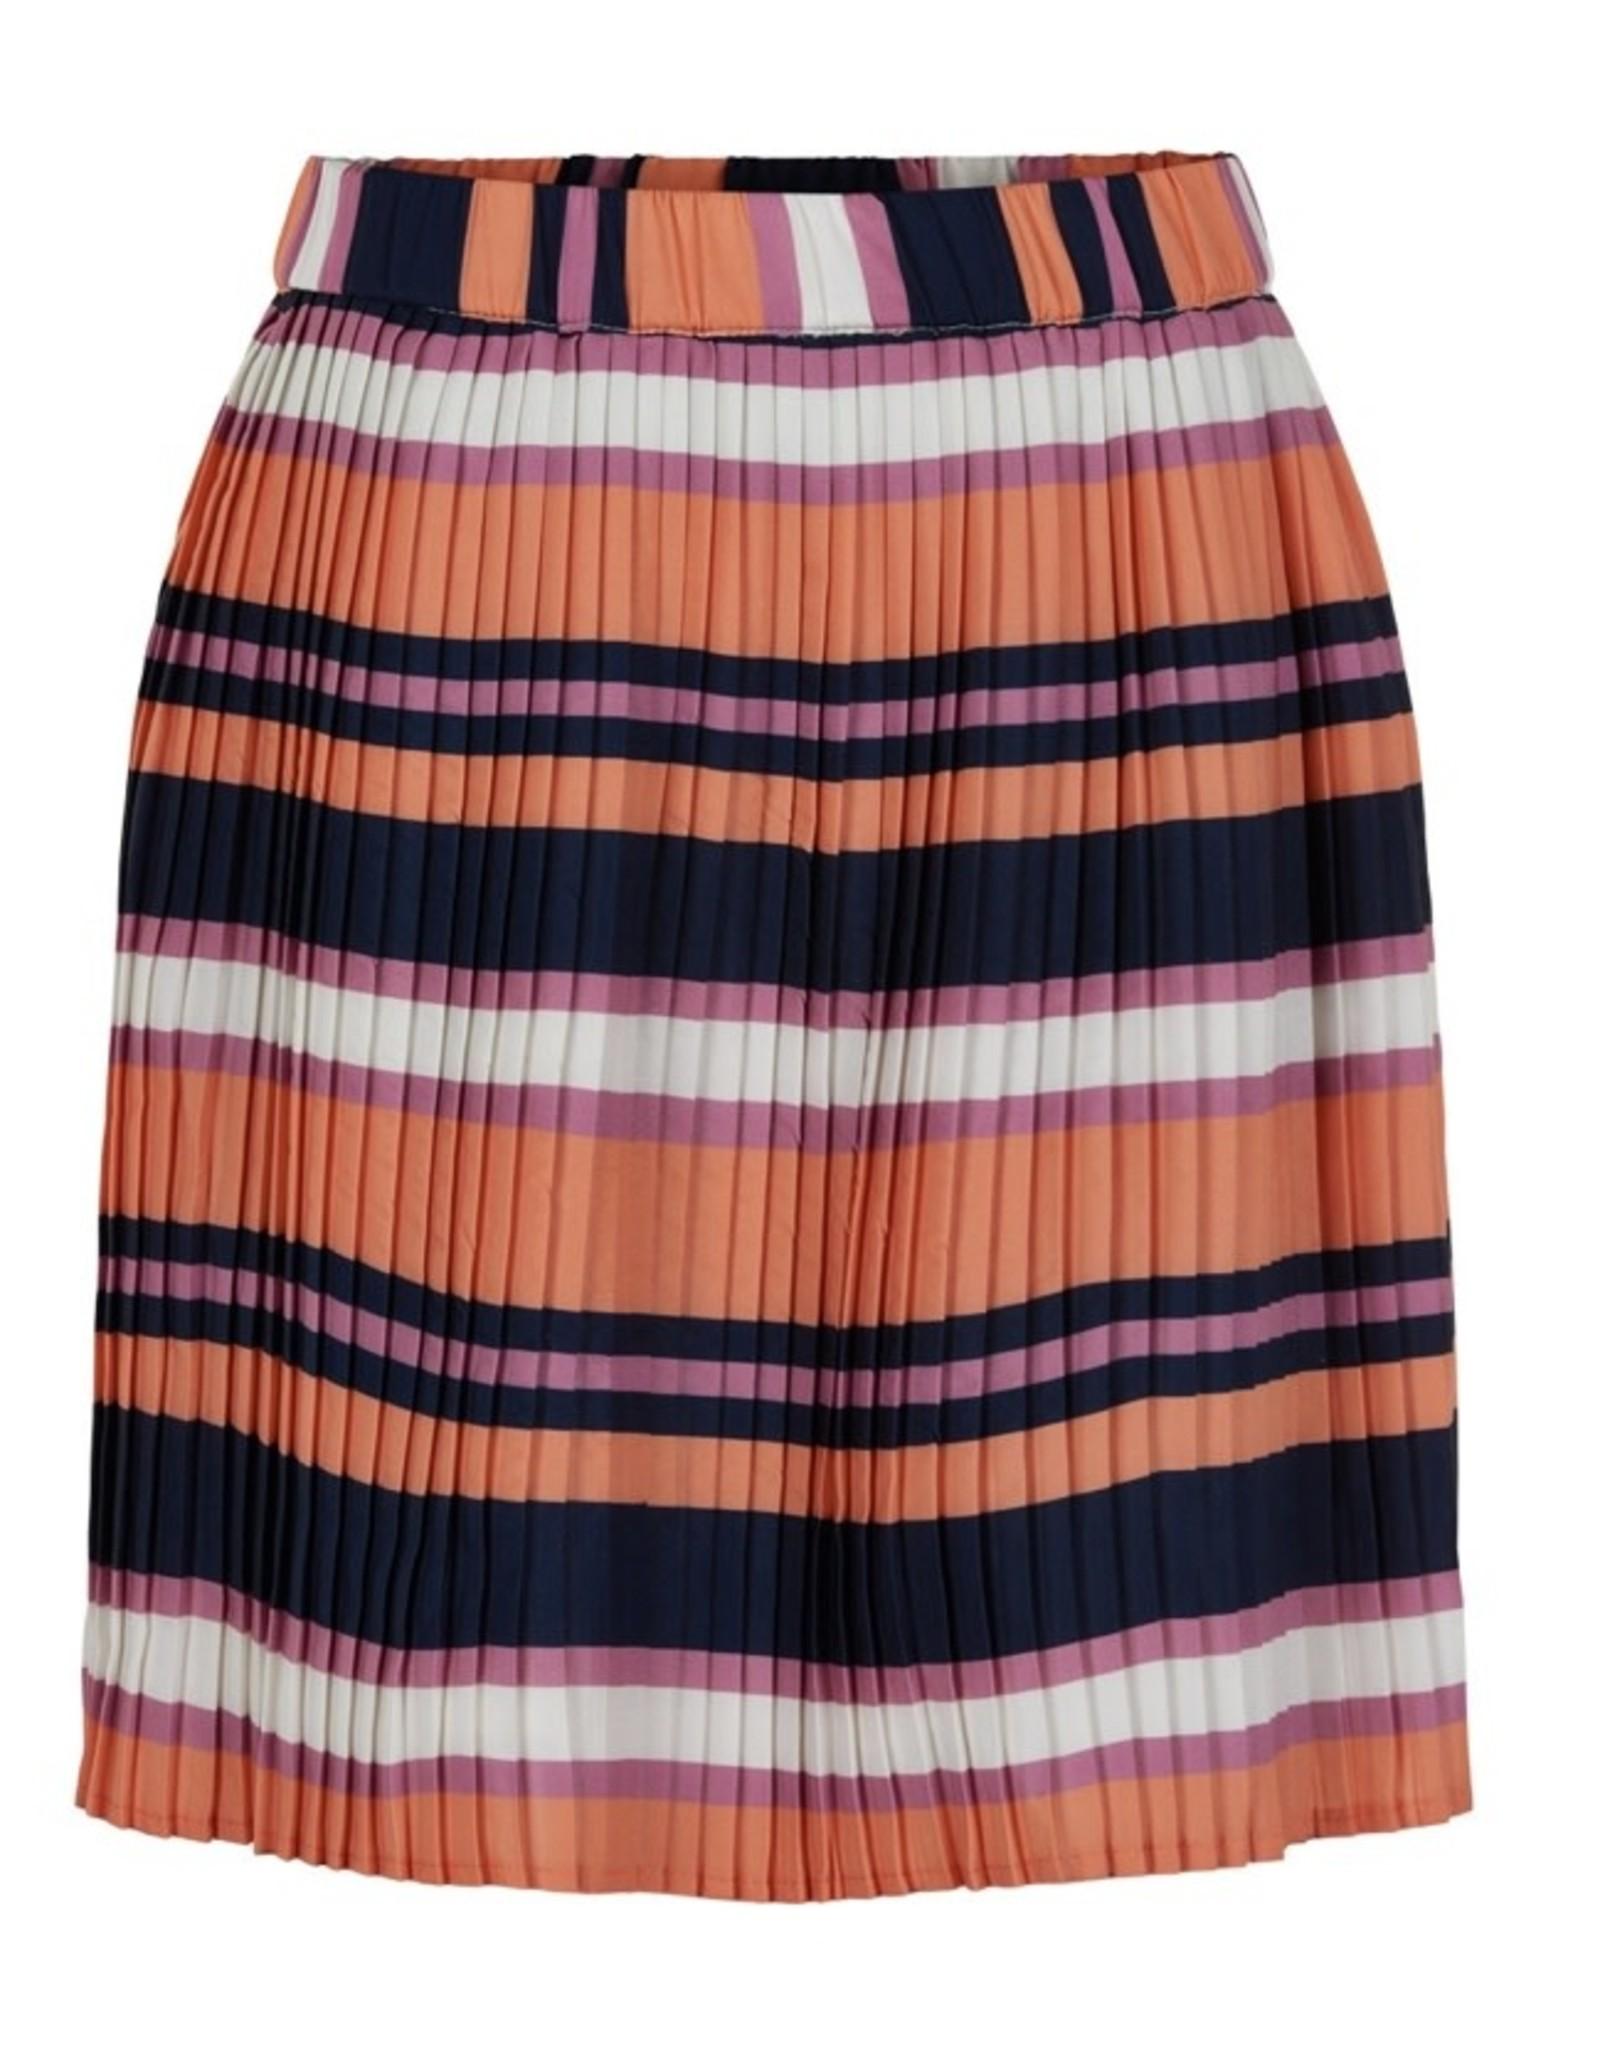 The New Tess Skirt